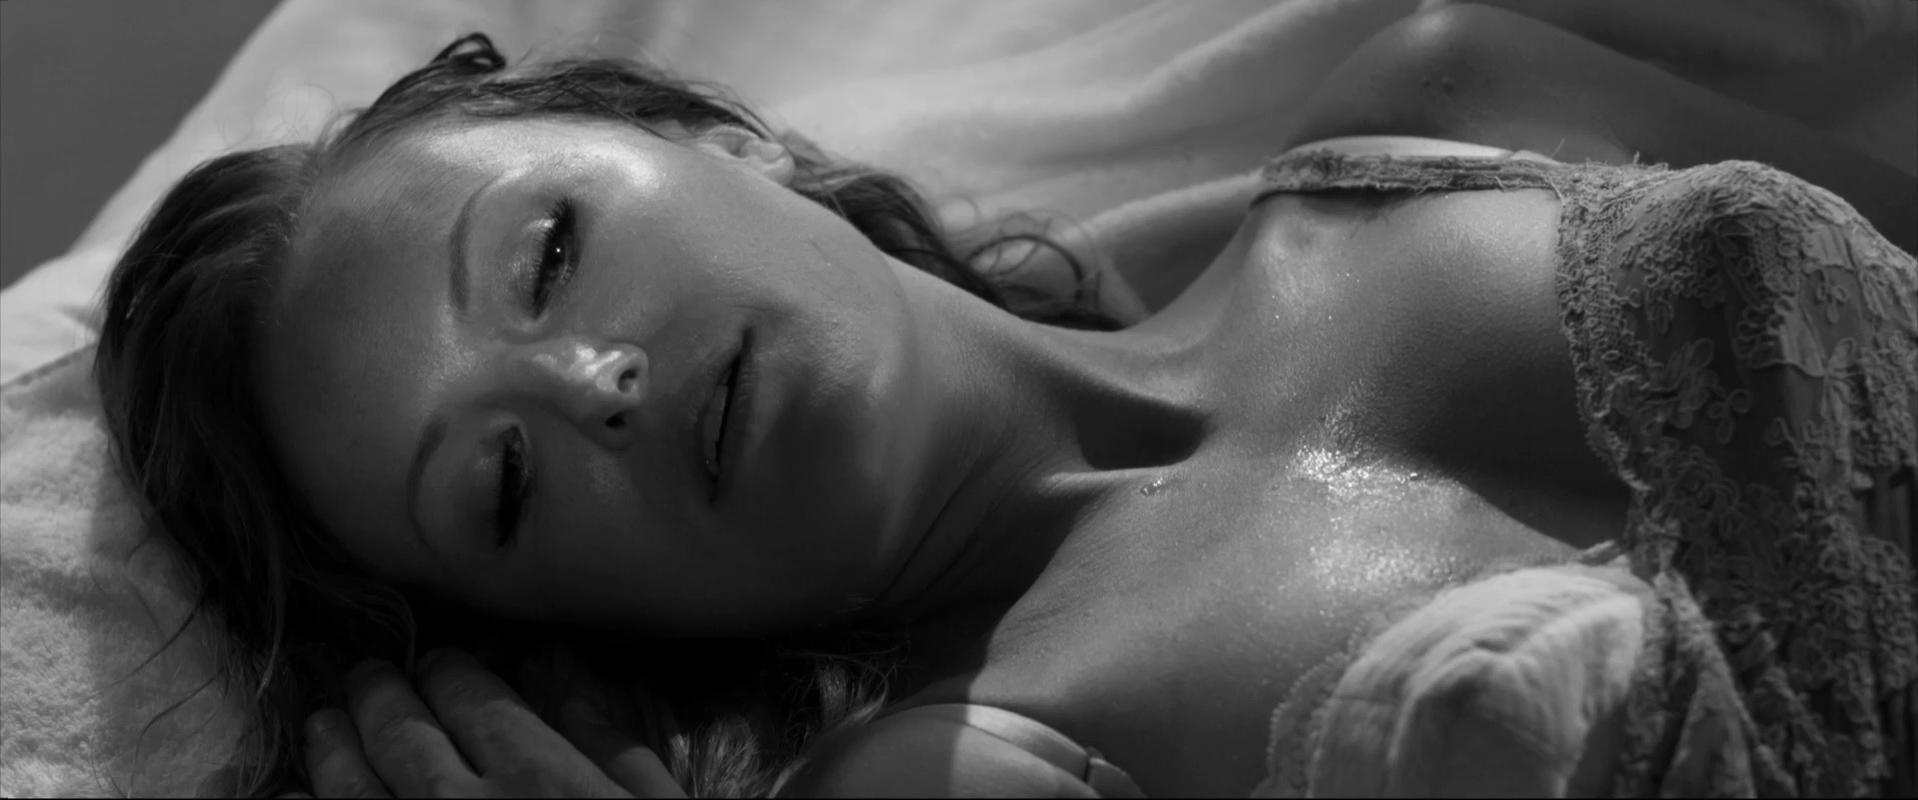 Malin Akerman sexy - Hotel Noir (2012)